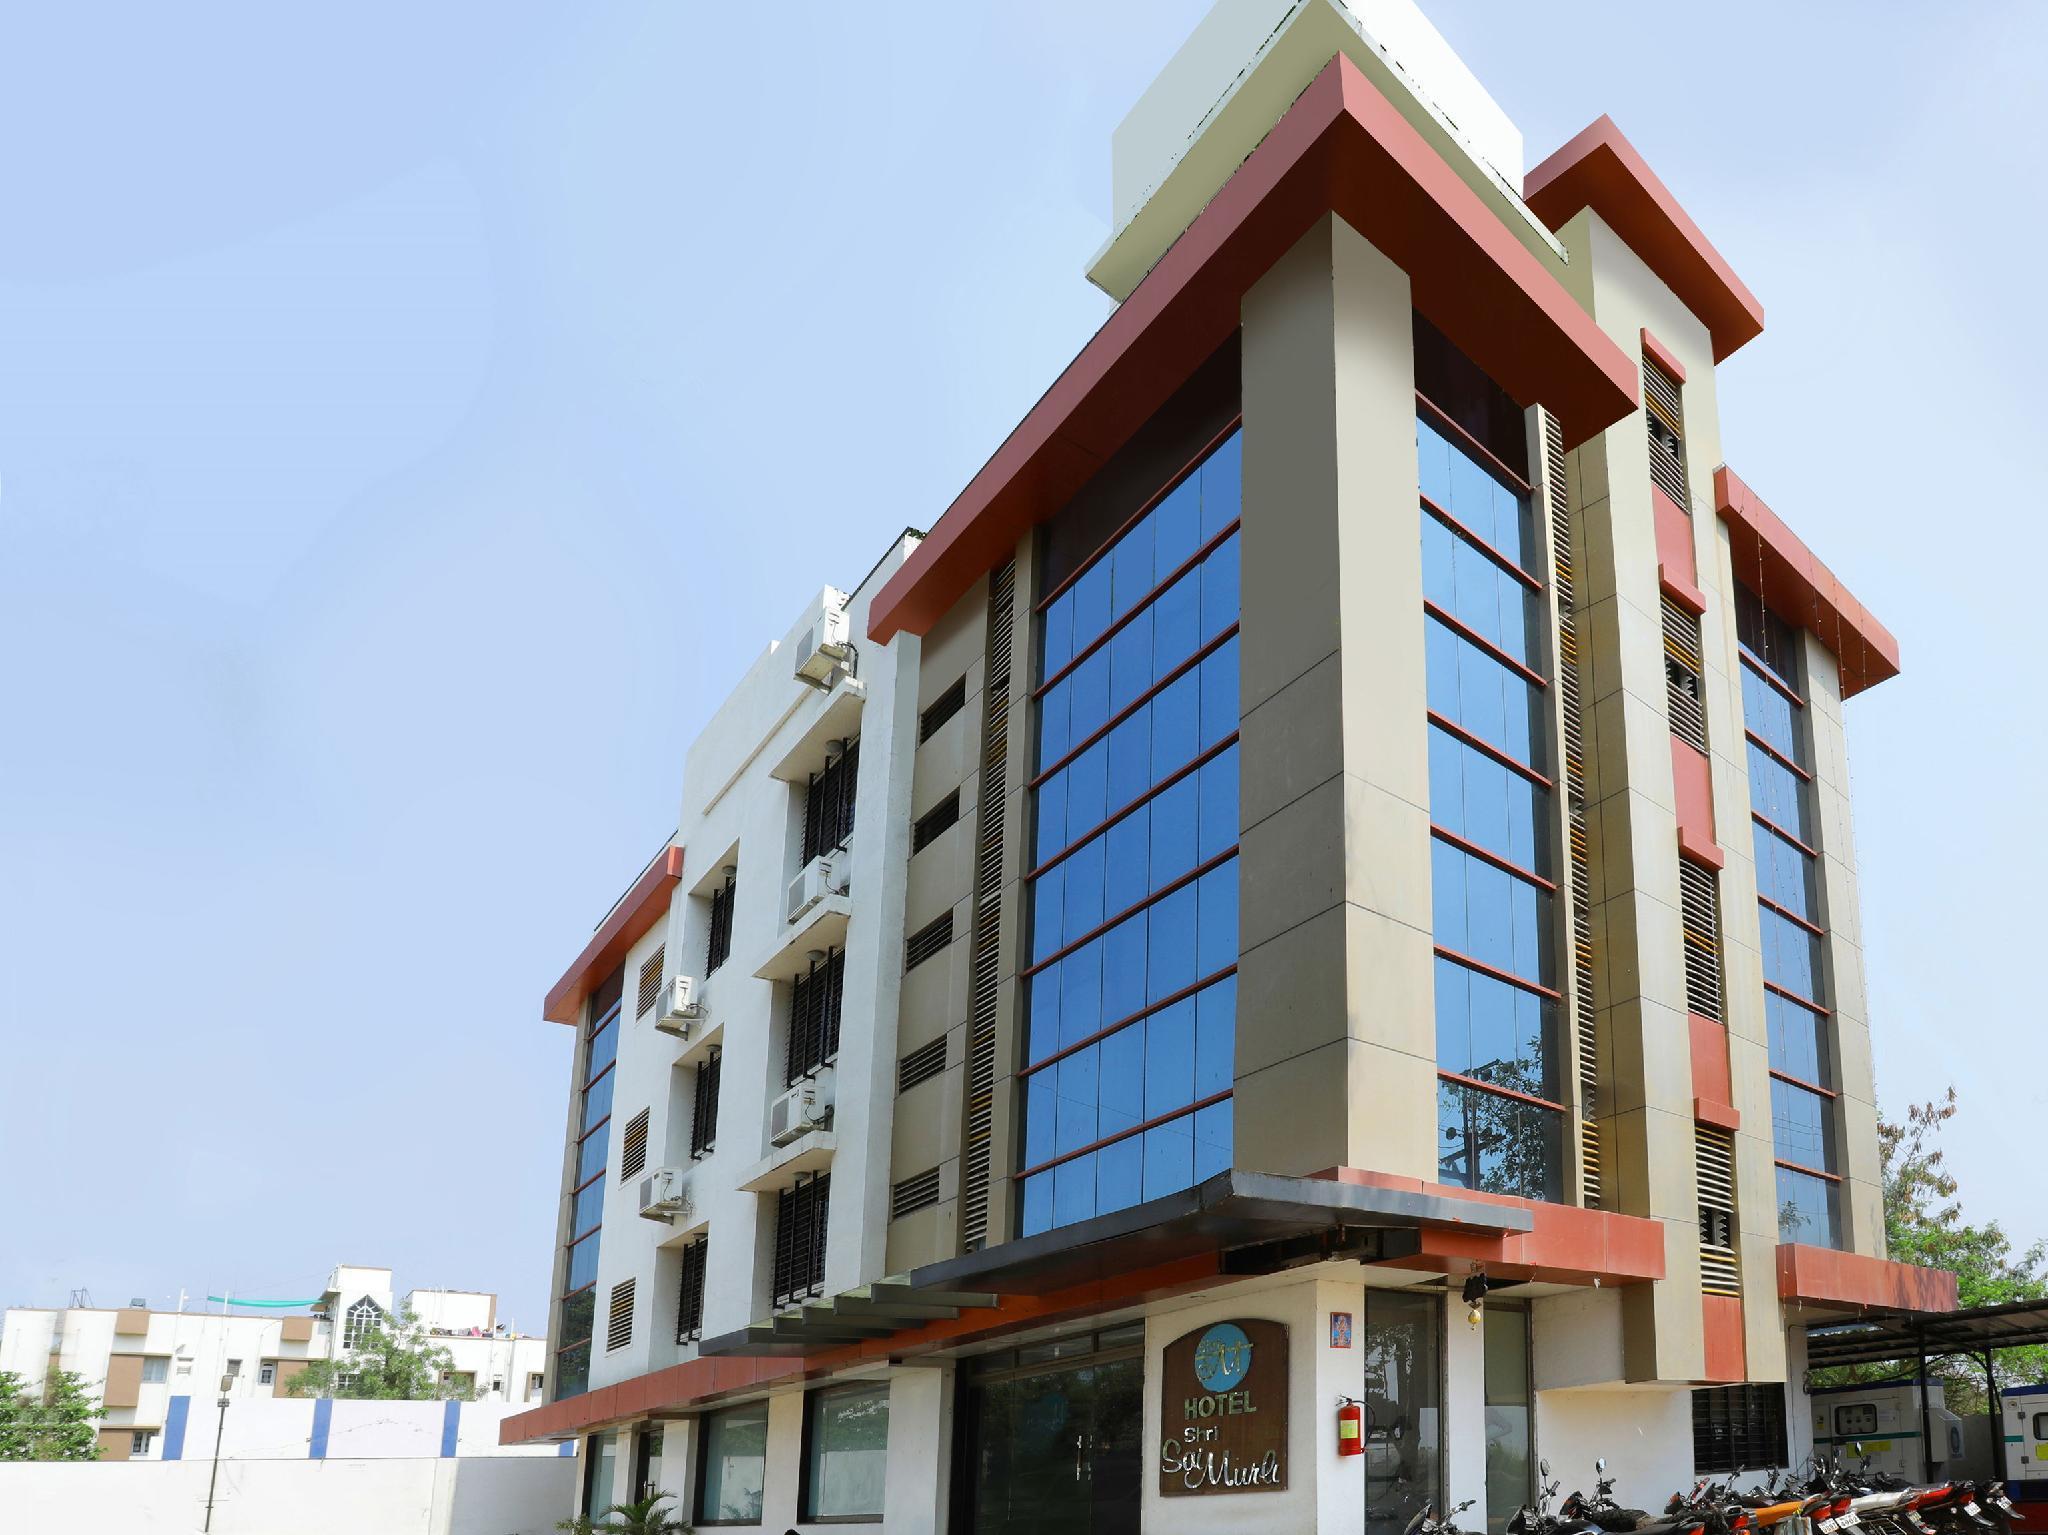 OYO 4198 Hotel Shri Sai Murli